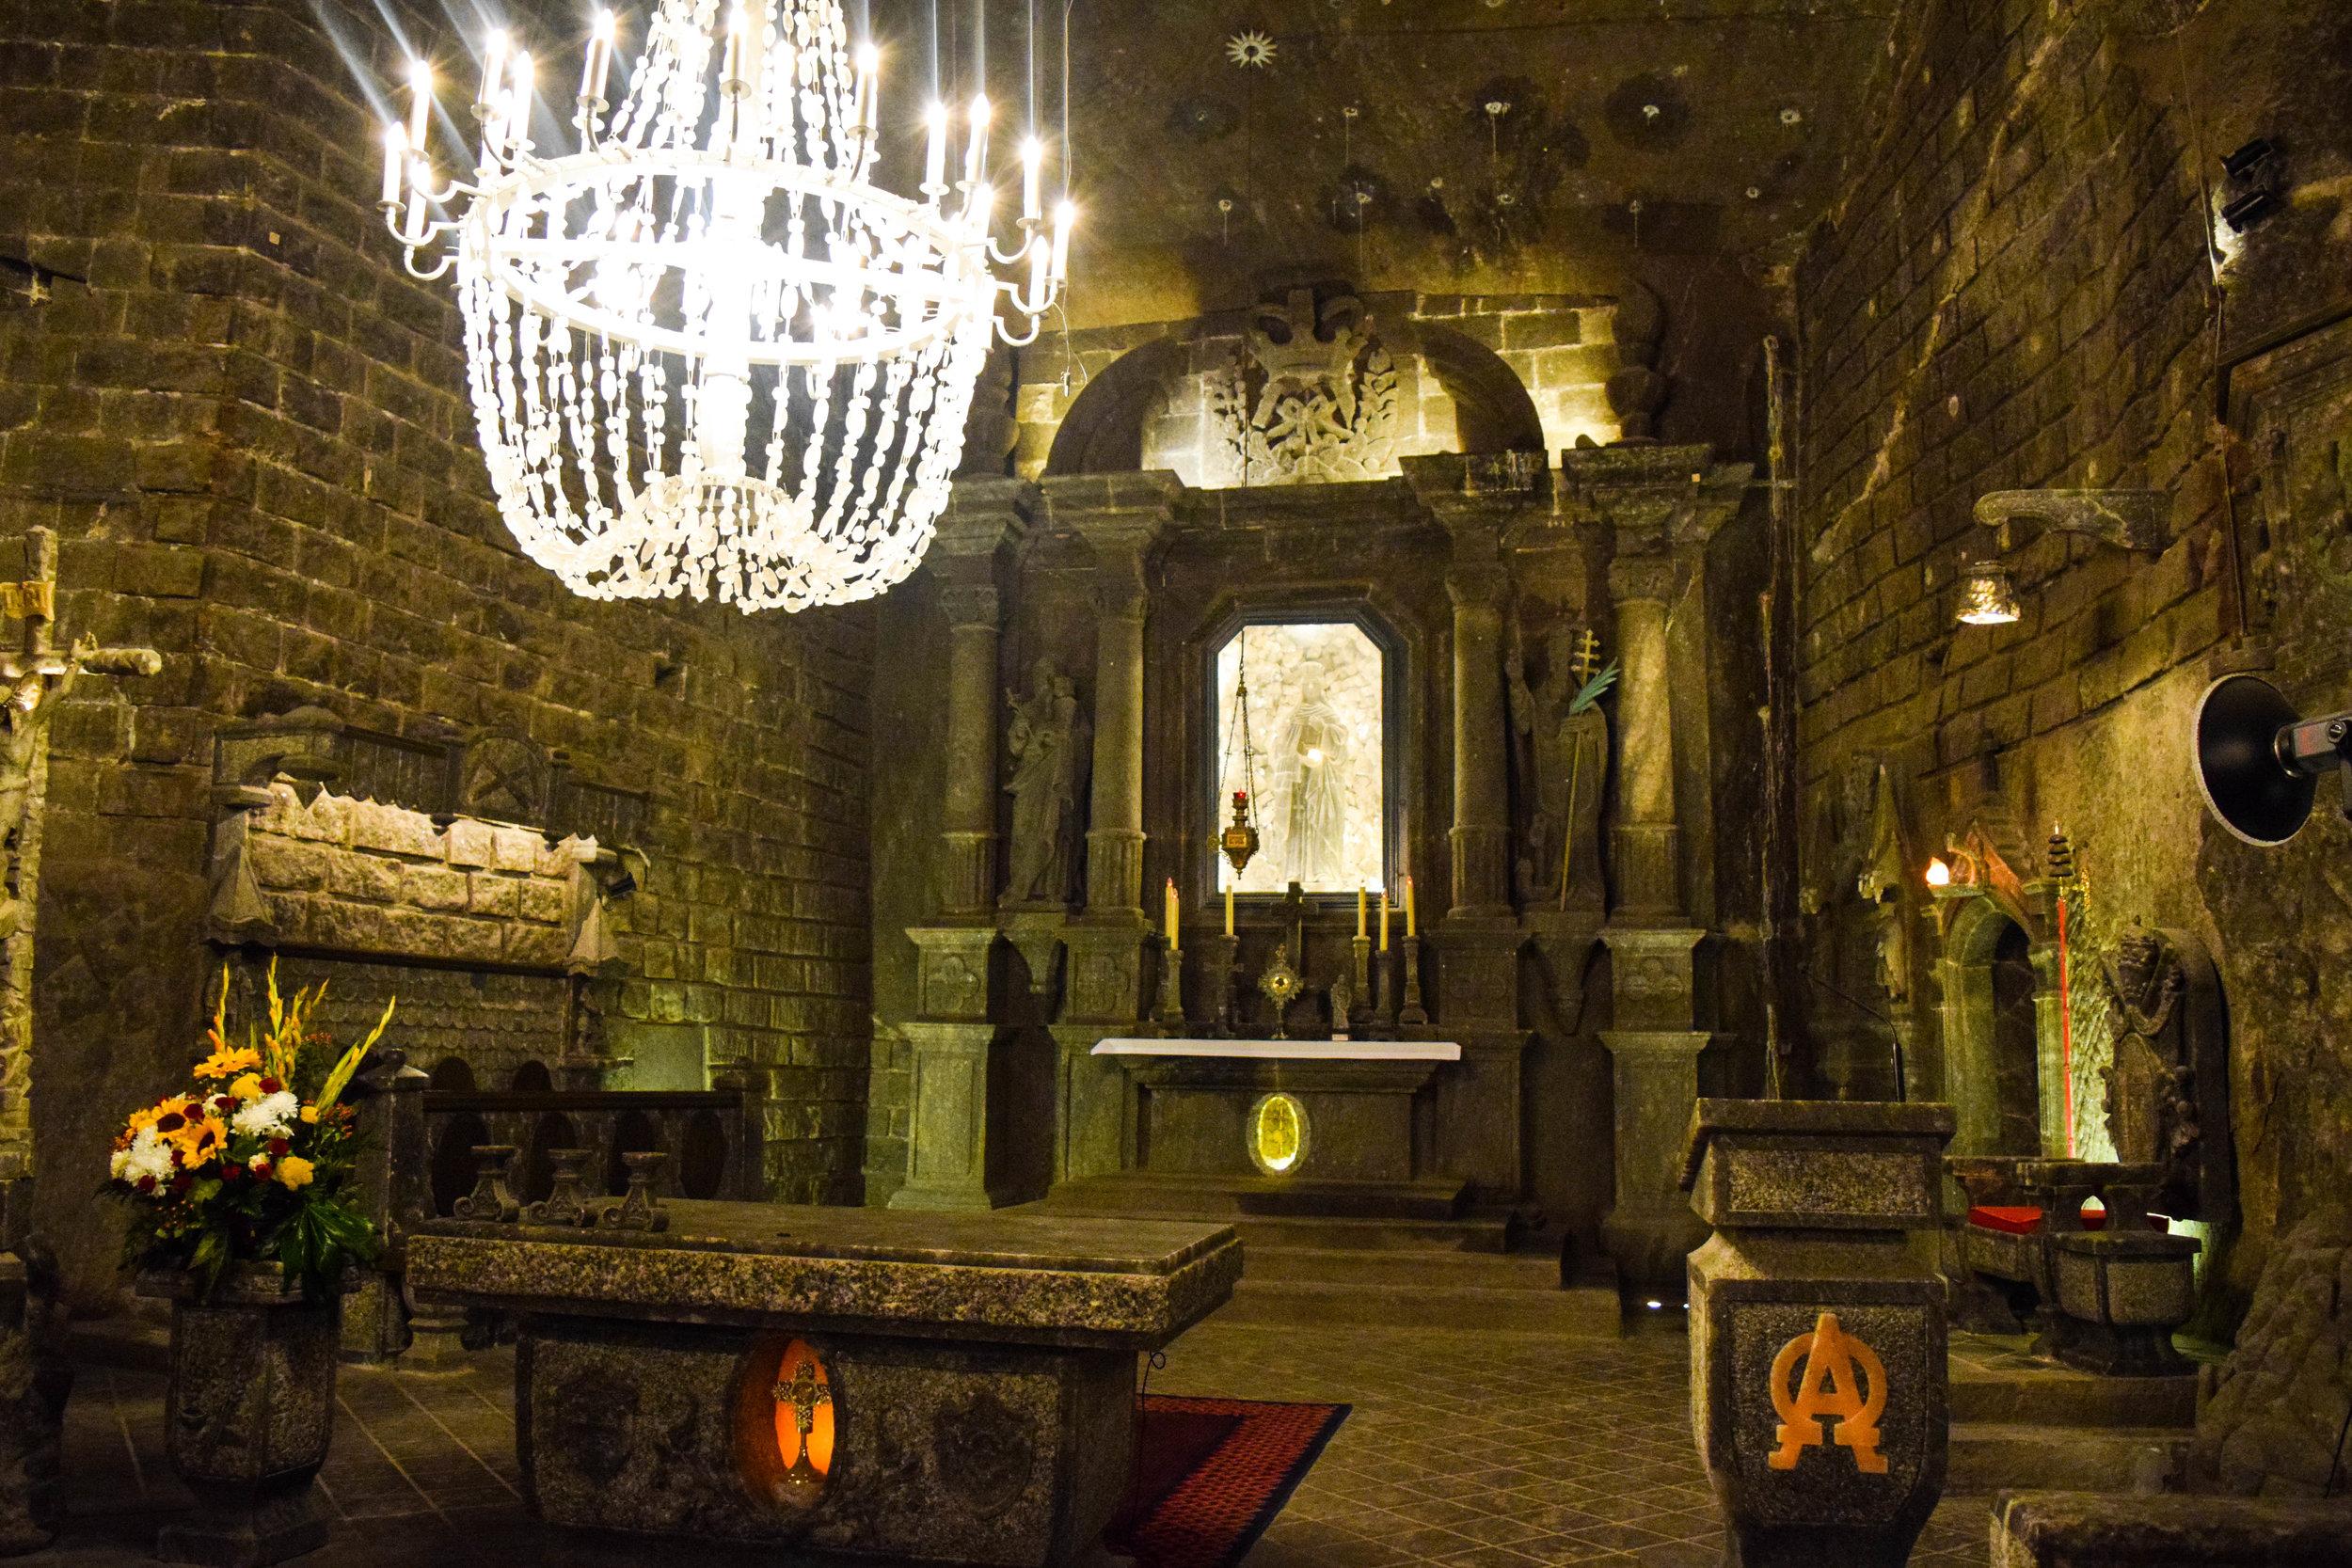 Salt altar in the large chapel room of the Wieliczka Salt Mine